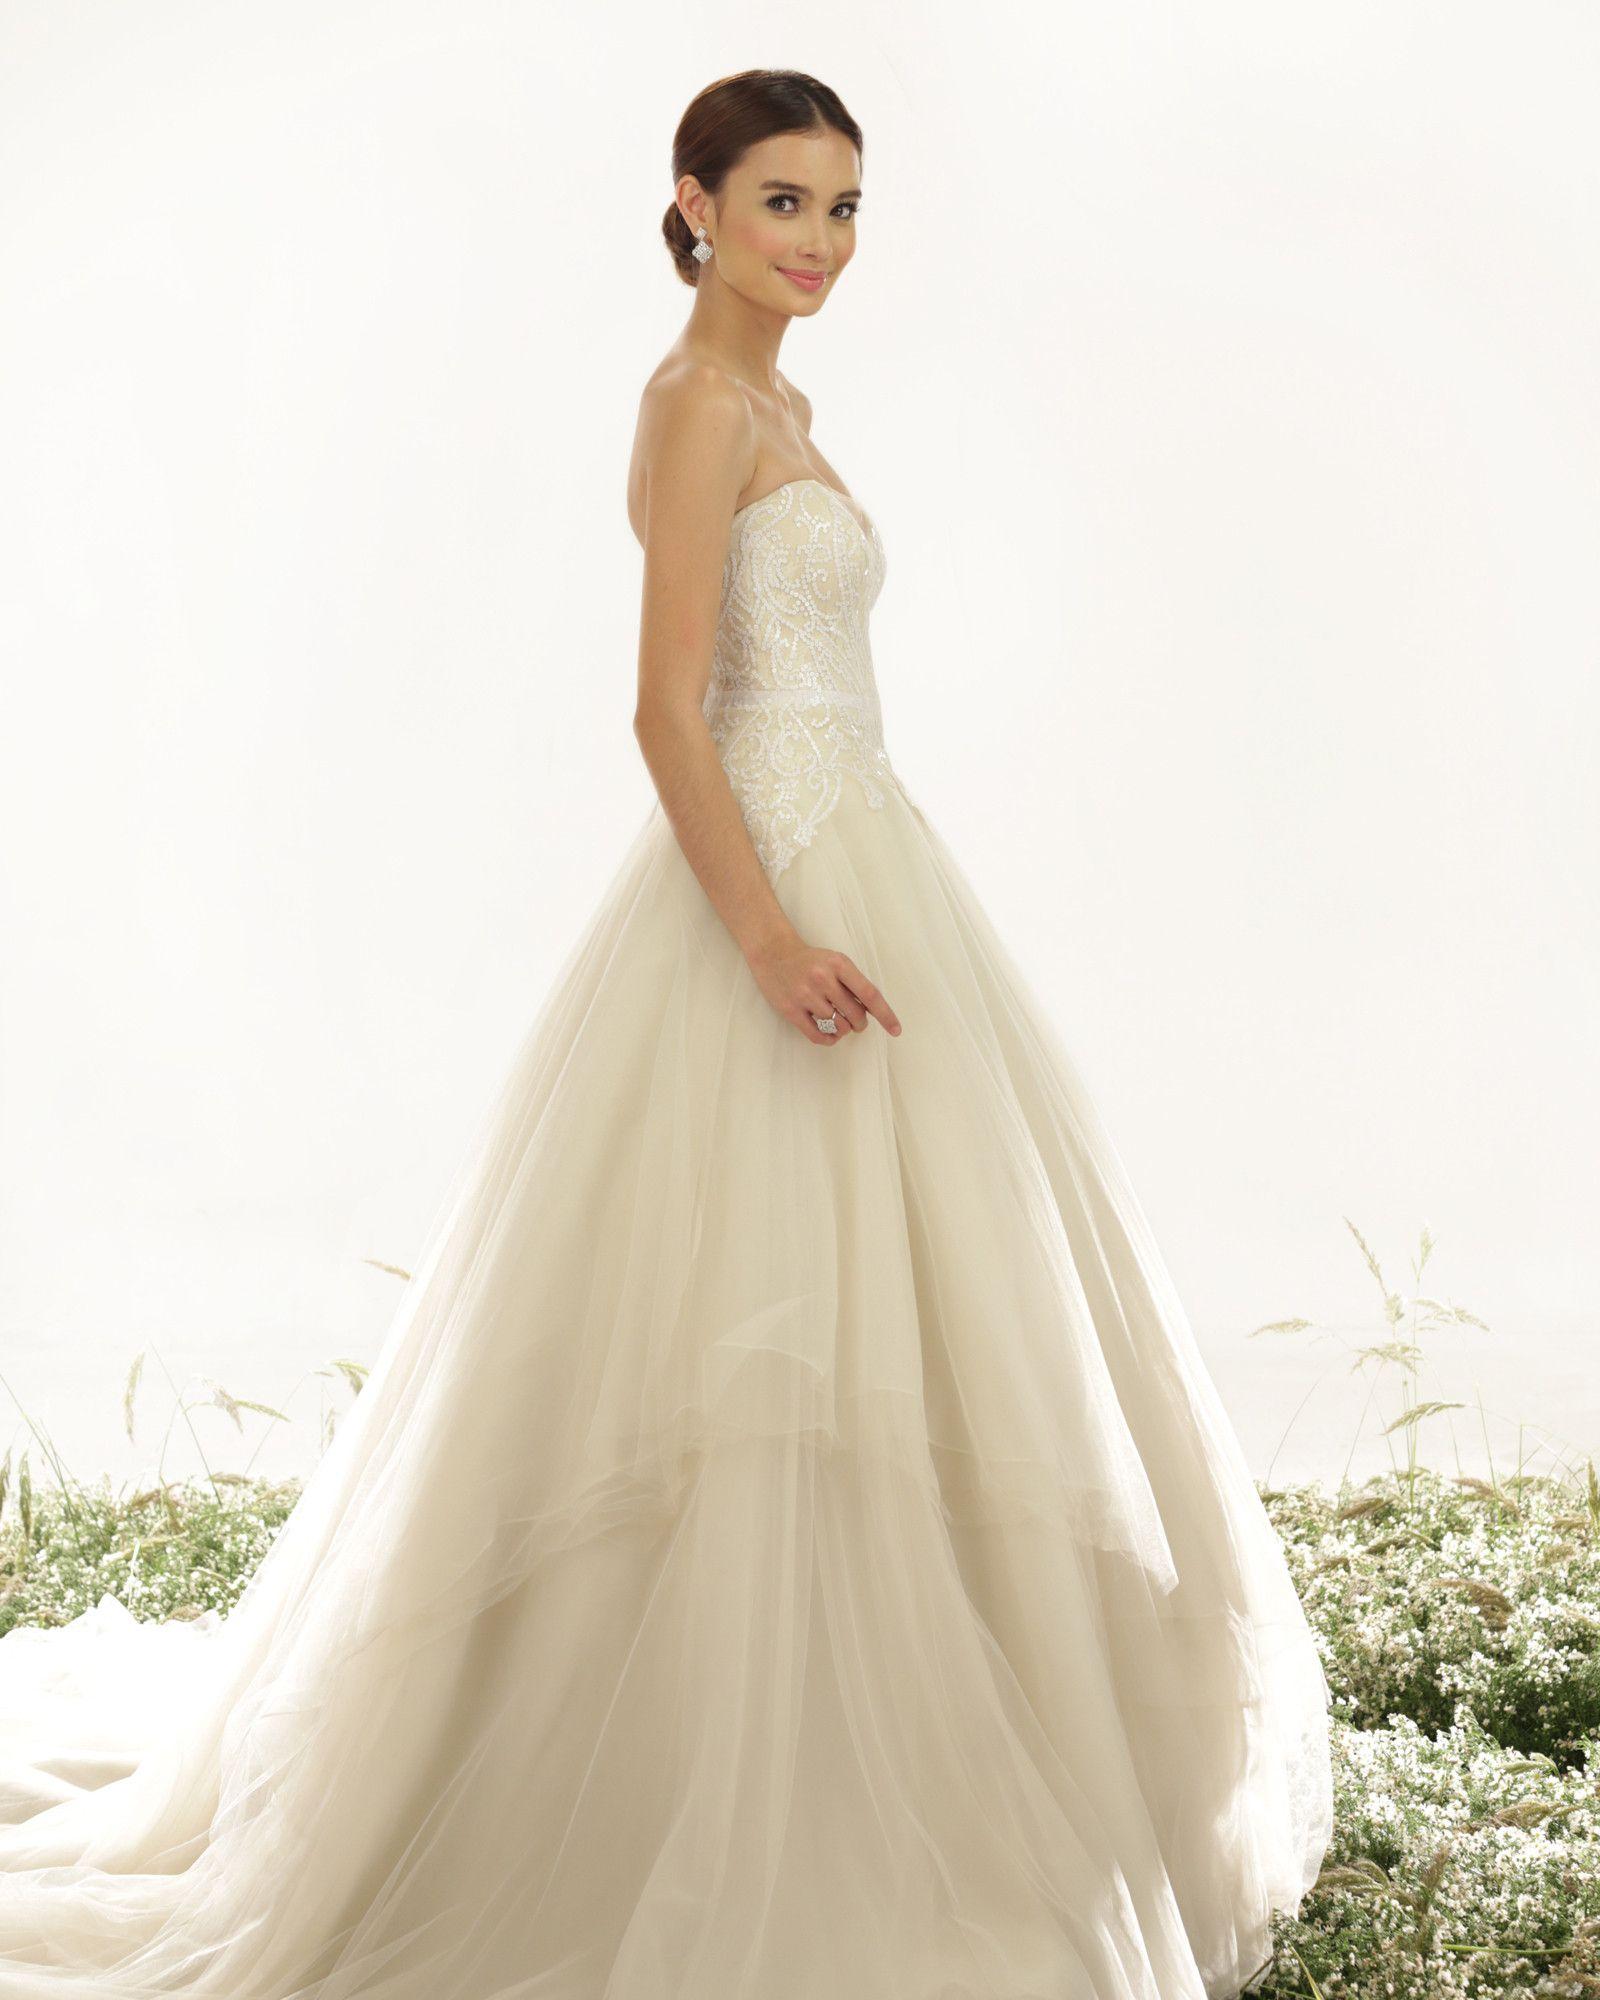 Simple and cheap wedding dresses  Alyssa  Veluz  Wedding Dresses   Pinterest  Products